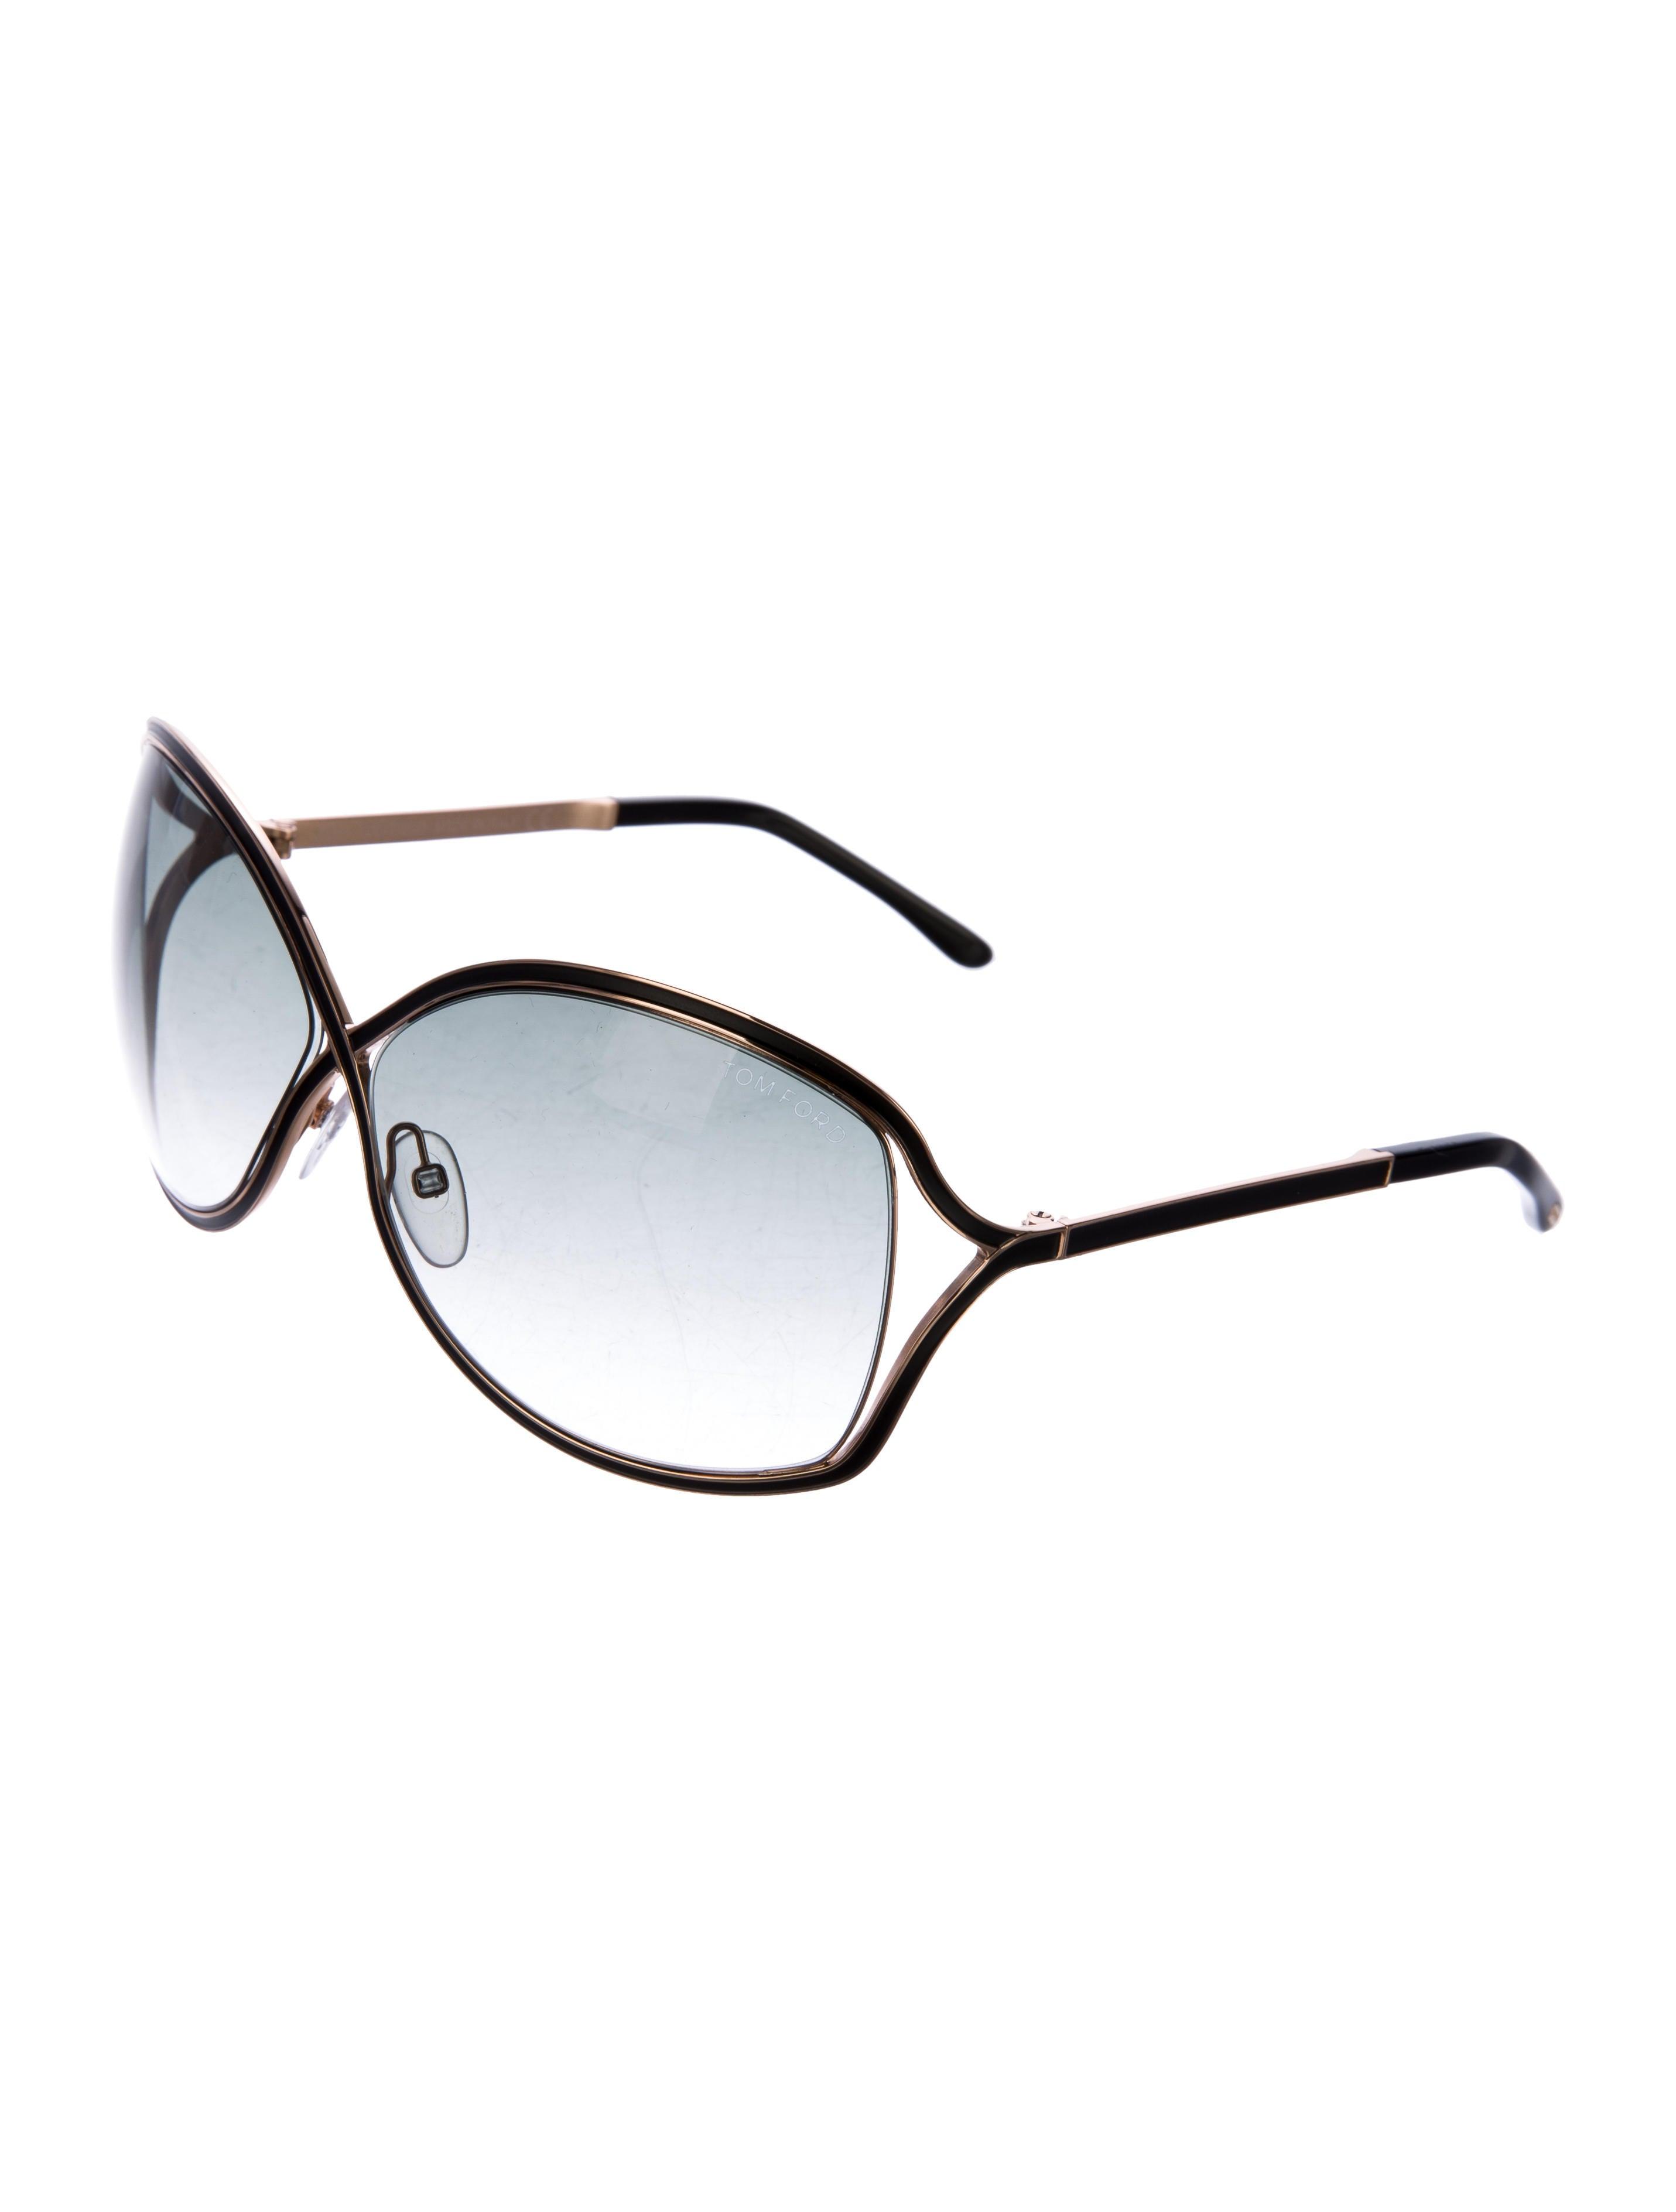 4f815eb039546 Tom Ford Rickie Gradient Sunglasses - Accessories - TOM35681